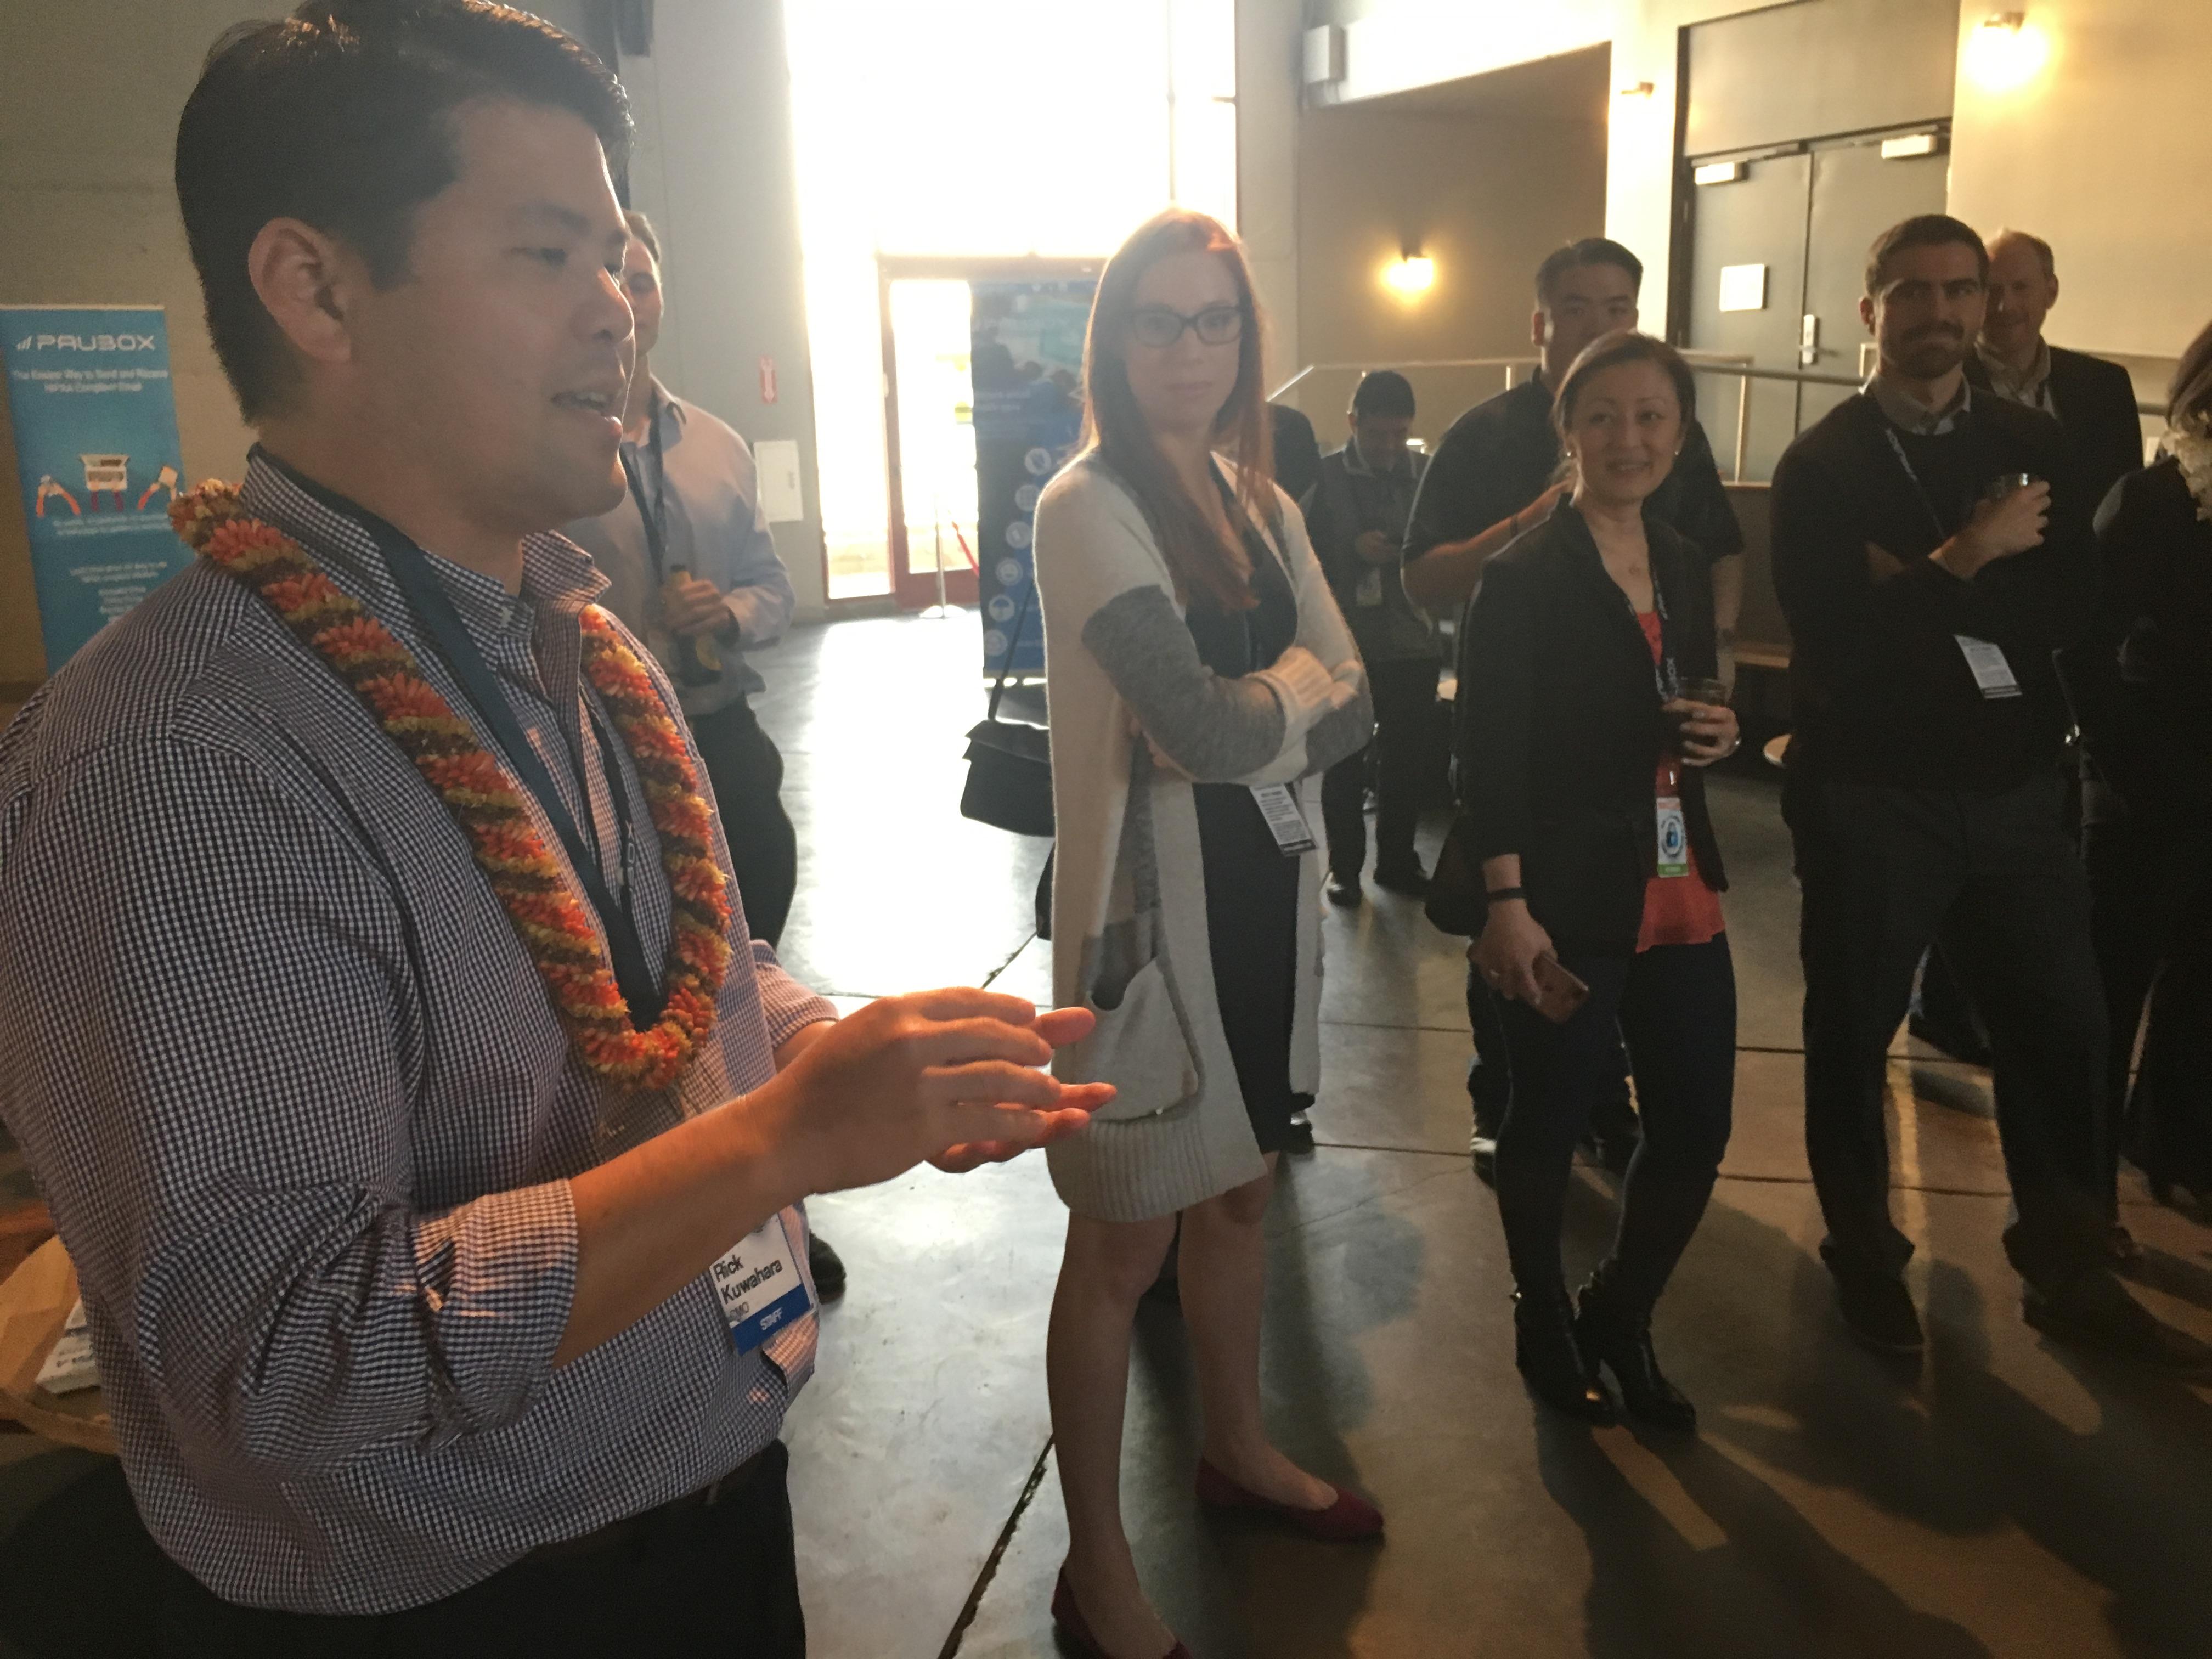 Rick Kuwahara - A Wake for the Fax Machine - Paubox SECURE Conference